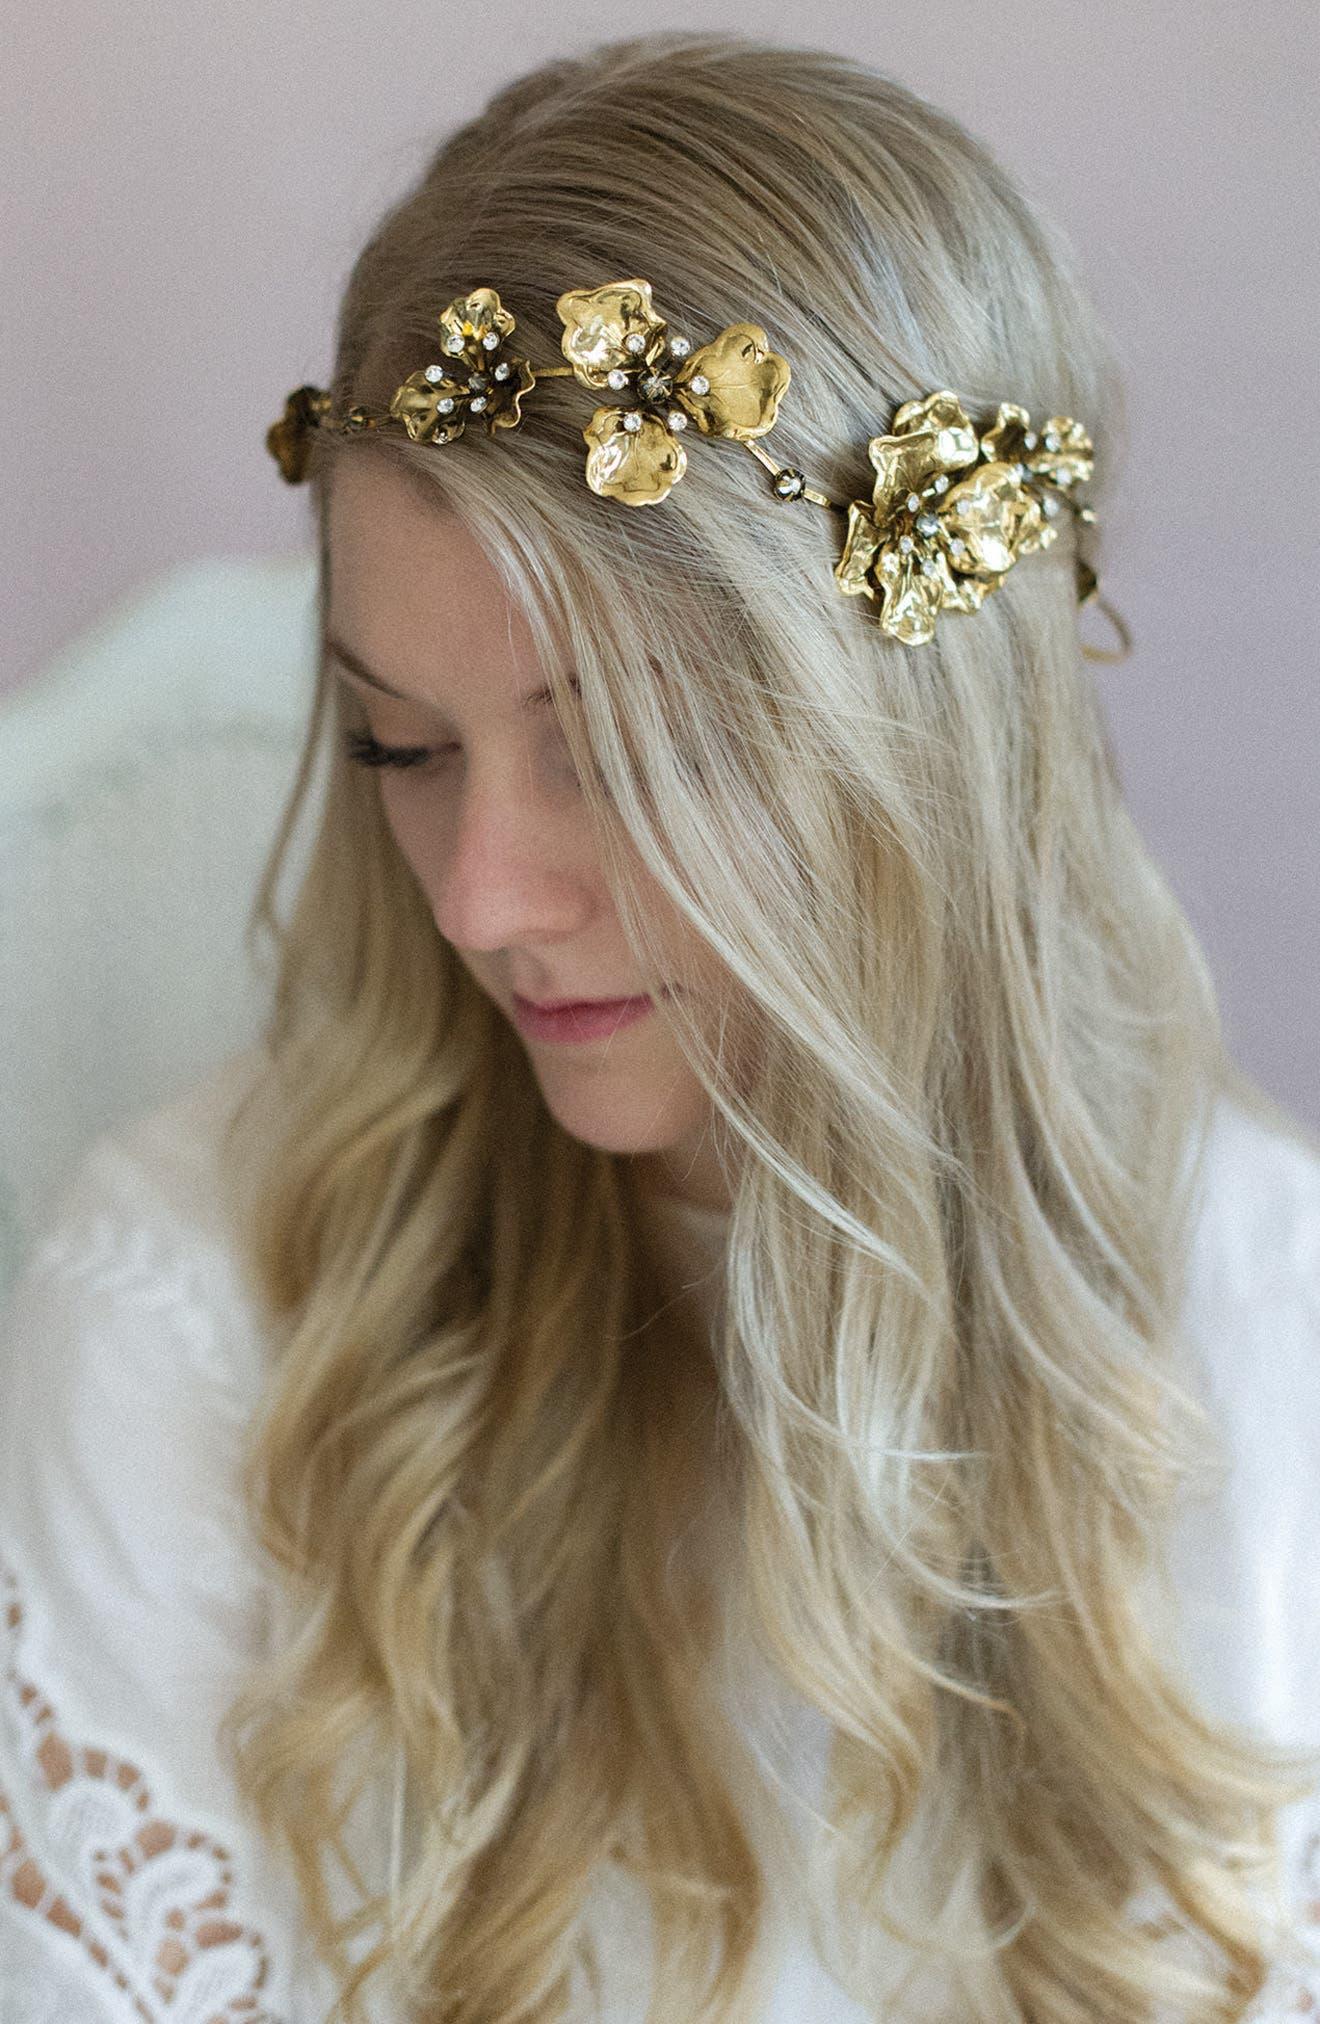 Wavy Gilded Antique Flower Headband,                             Alternate thumbnail 2, color,                             710